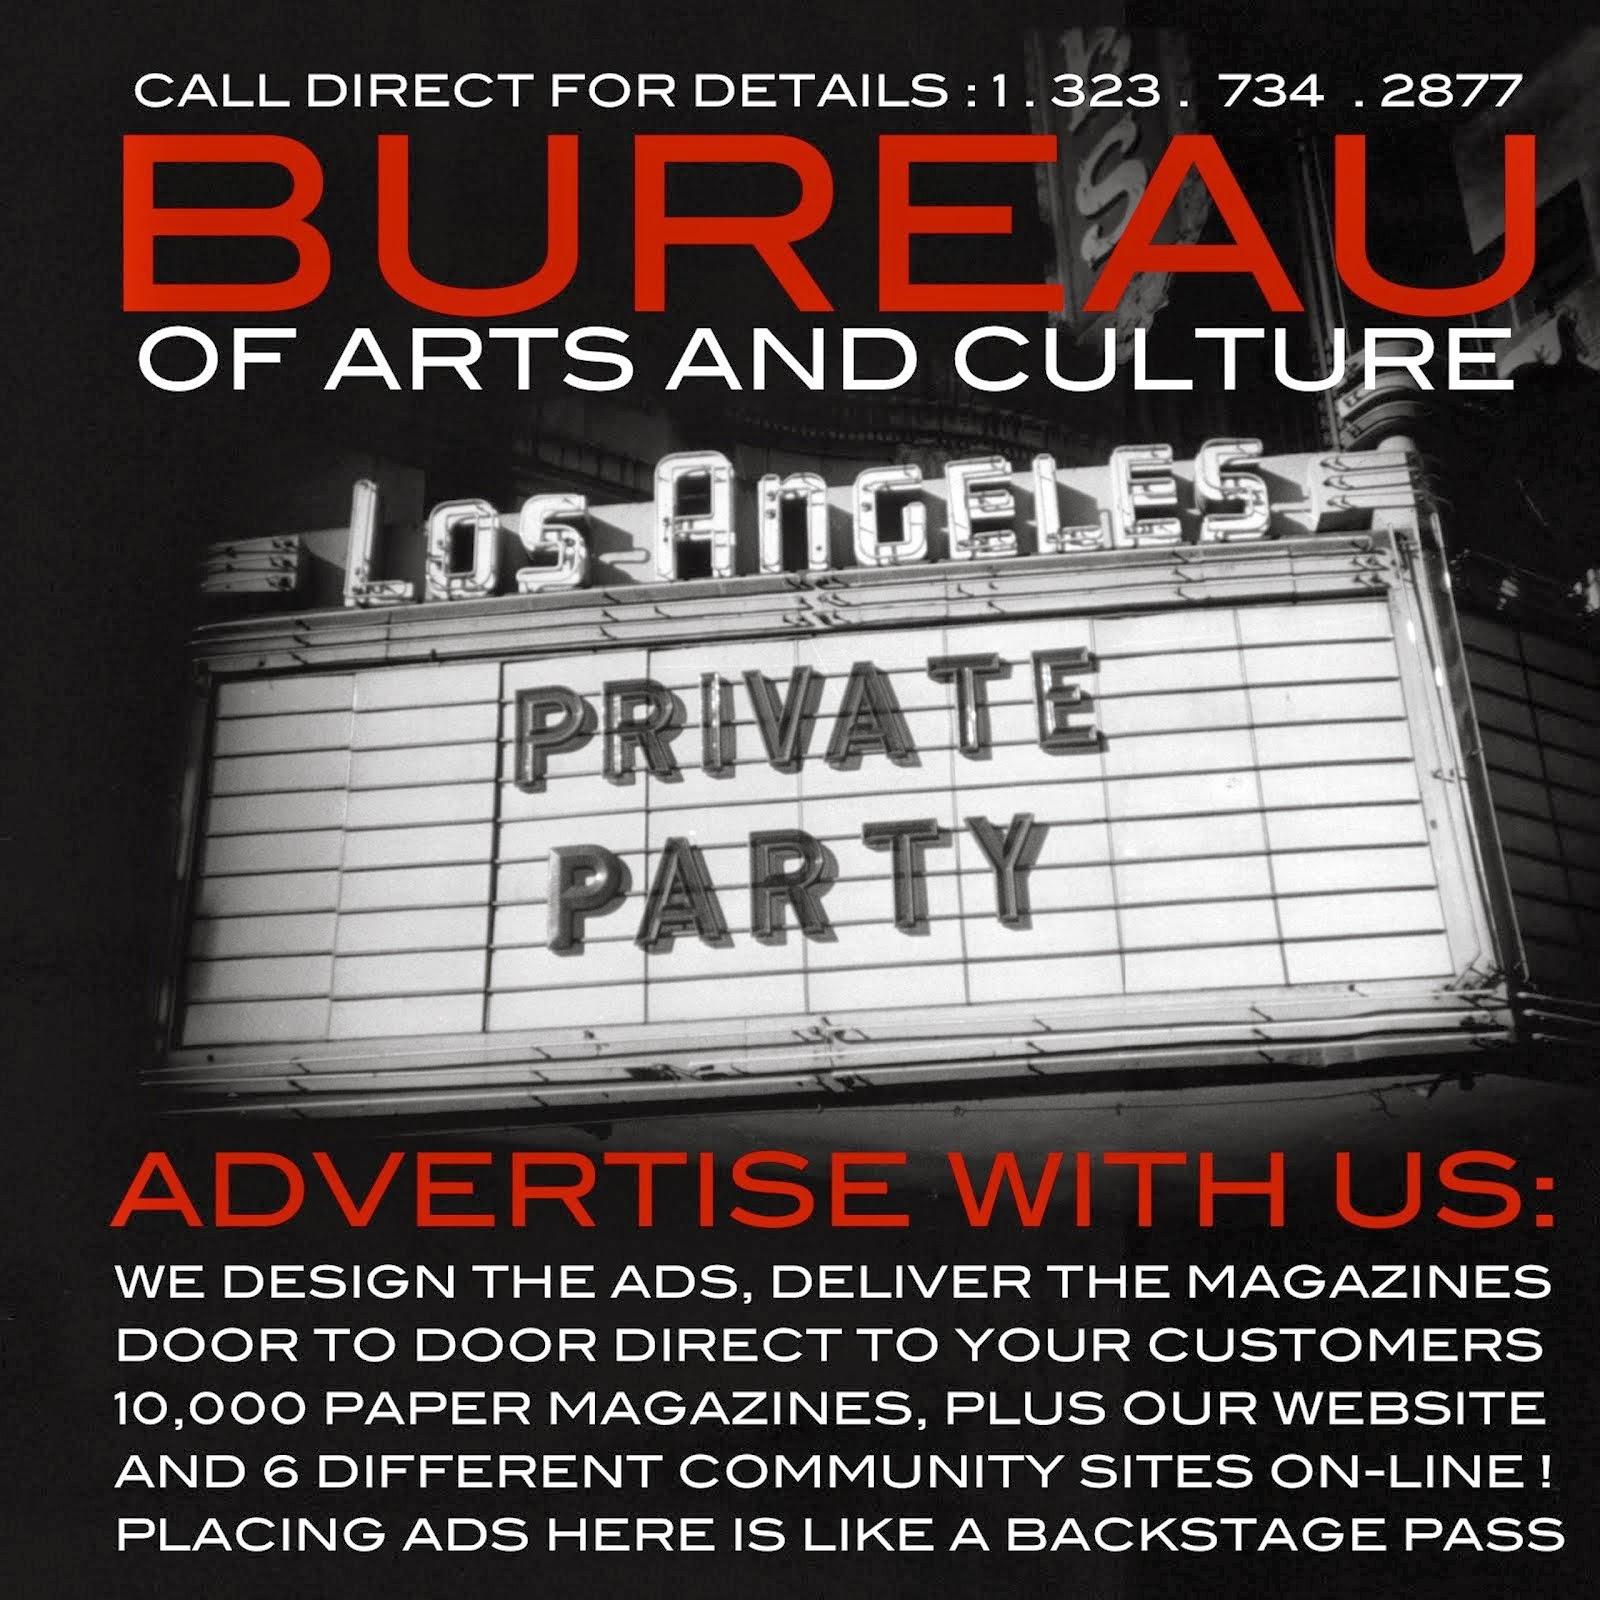 http://www.bureauofartsandculture.com/BUREAU-DONATION-and-STORE.html